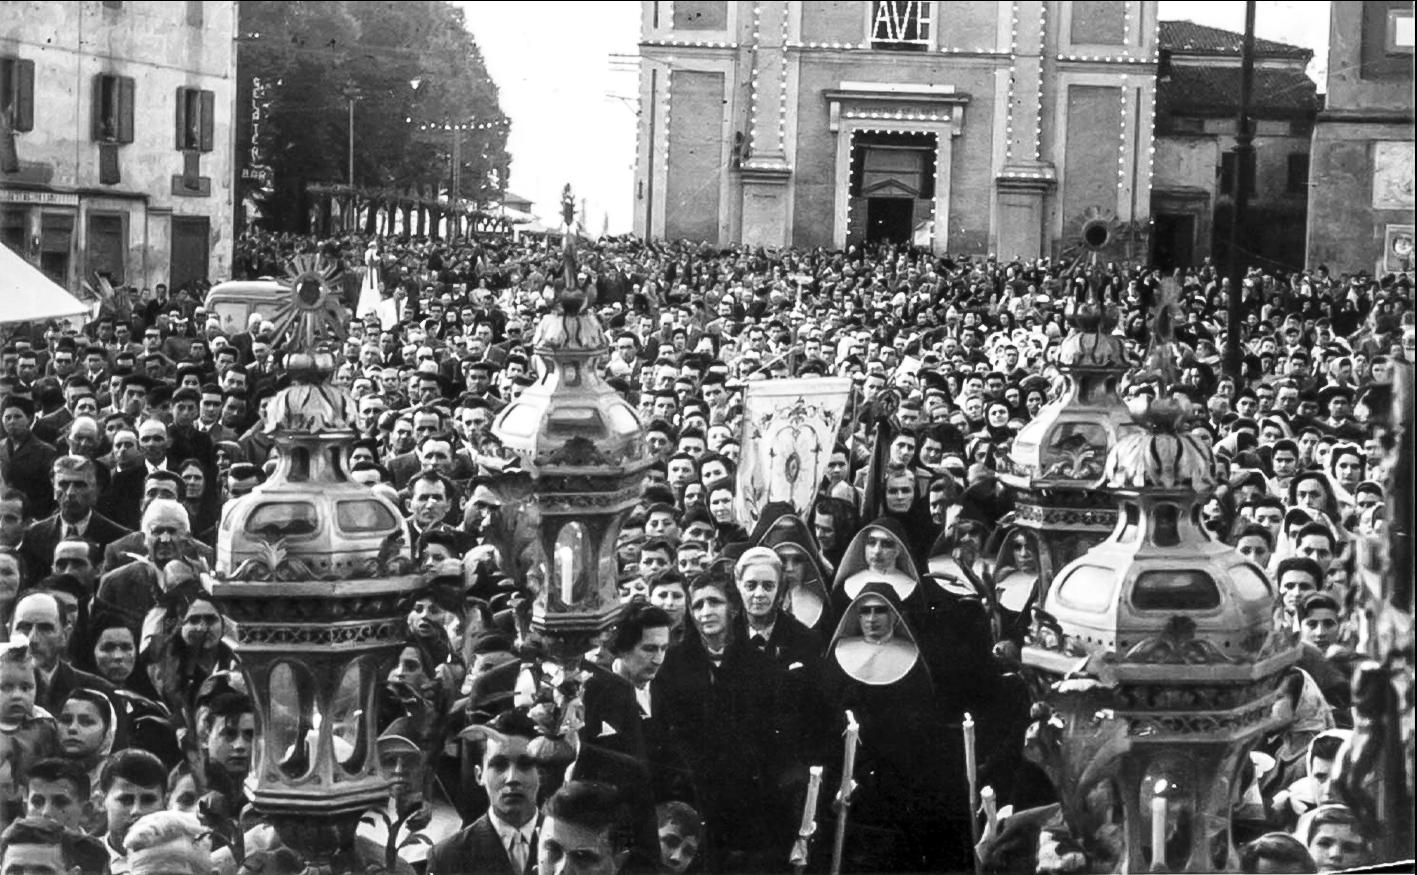 1954 XVII centenario agostiniano